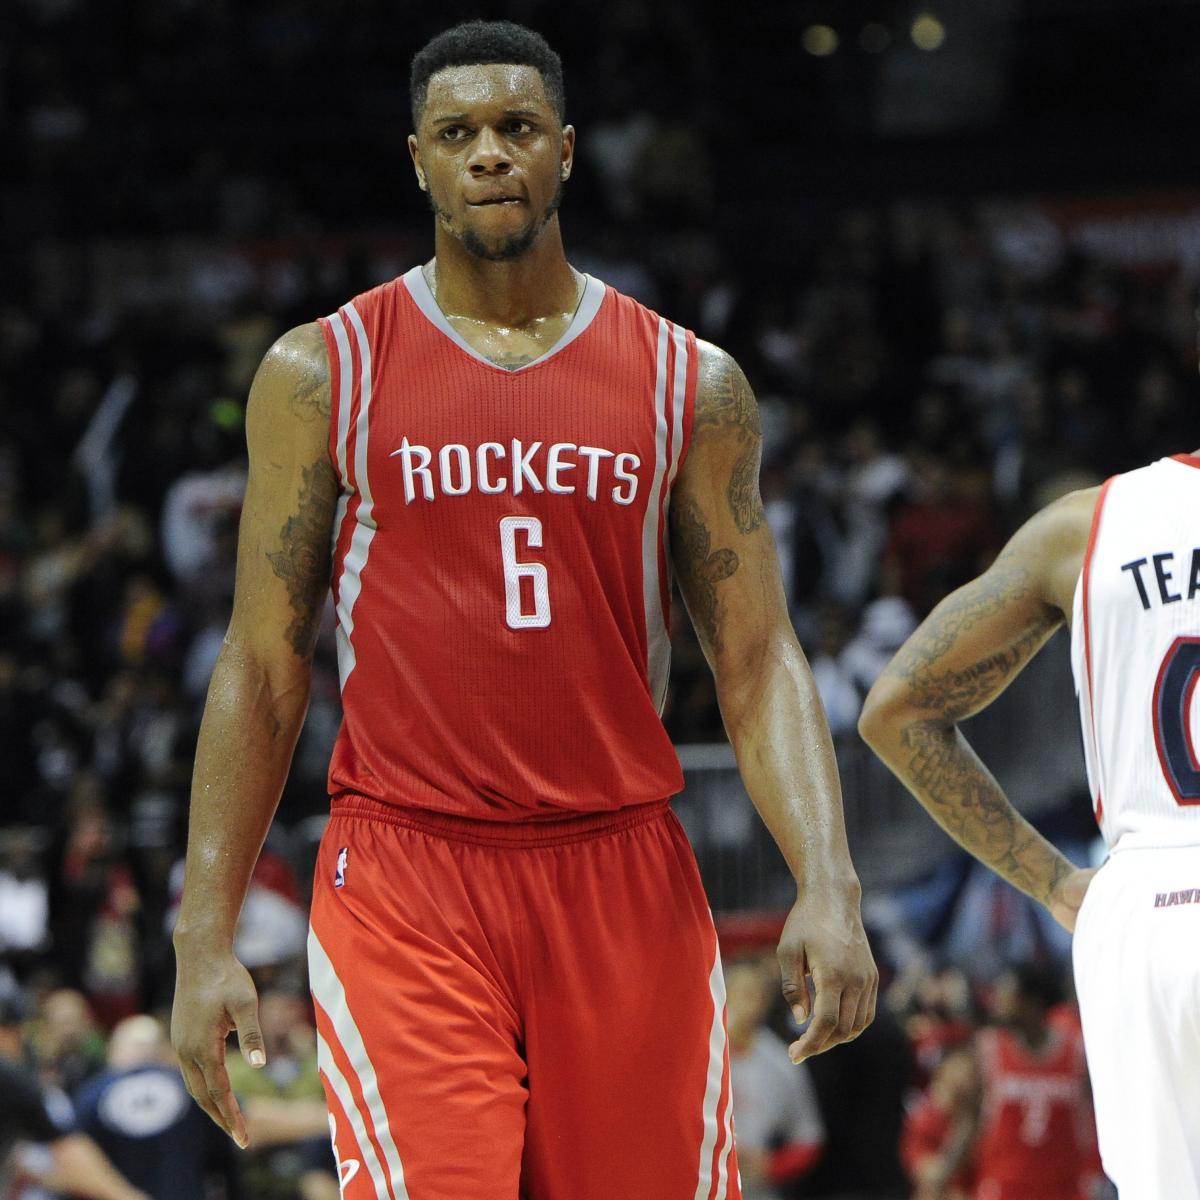 Nuggets Vs Rockets 2014: Terrence Jones Injury: Updates On Rockets Forward's Ribs